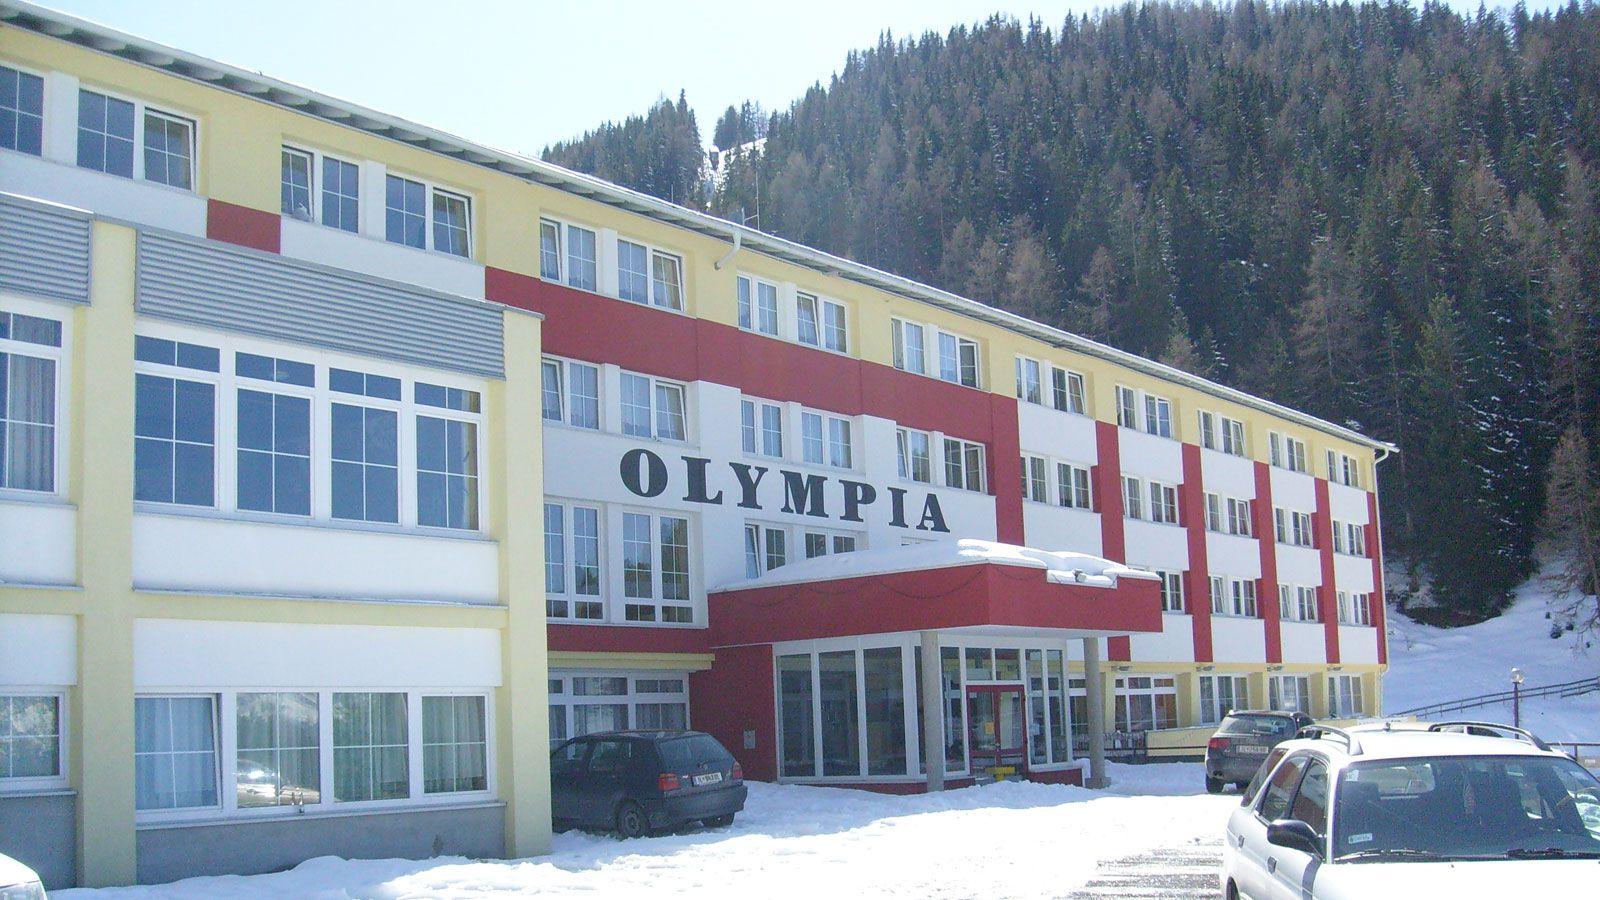 Hotel Olympia Axamer School Ski Trip Accommodation : SS G Ski Austria Hotel Axamer Lizum Hotel Olympia Outside of Hotel from www.pgl.co.uk size 1600 x 900 jpeg 246kB